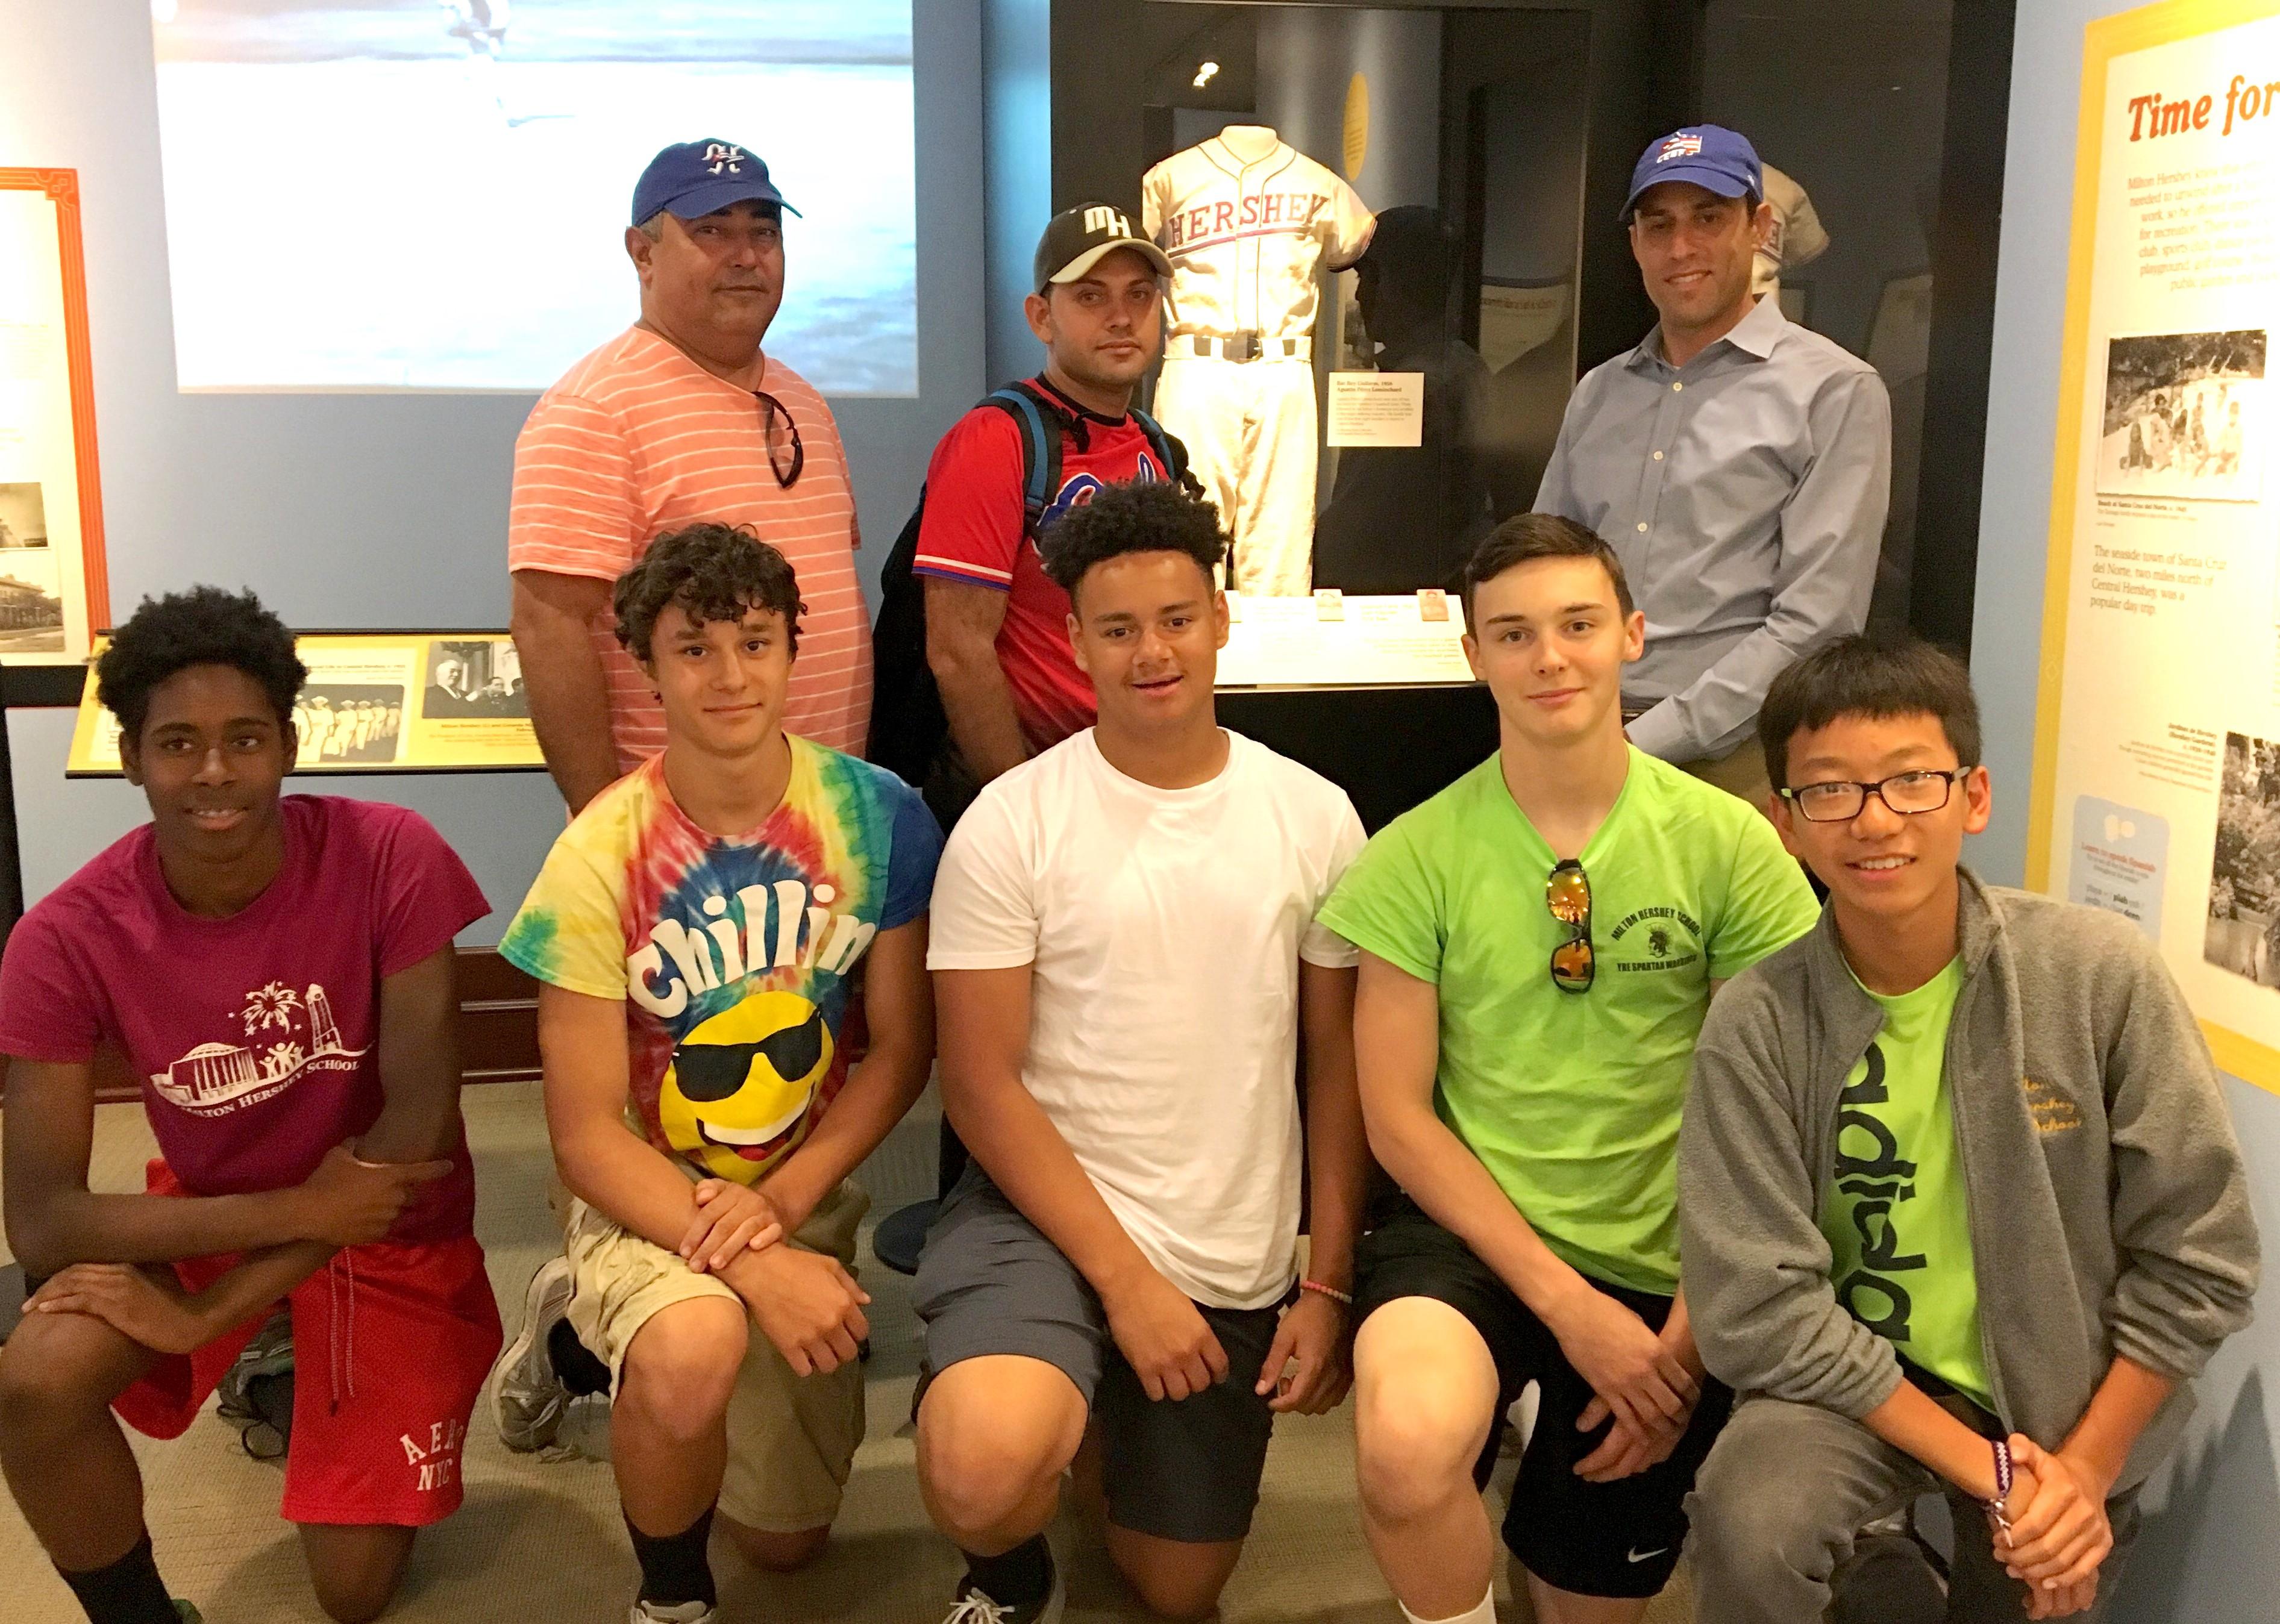 MHS baseball team visits an exhibit